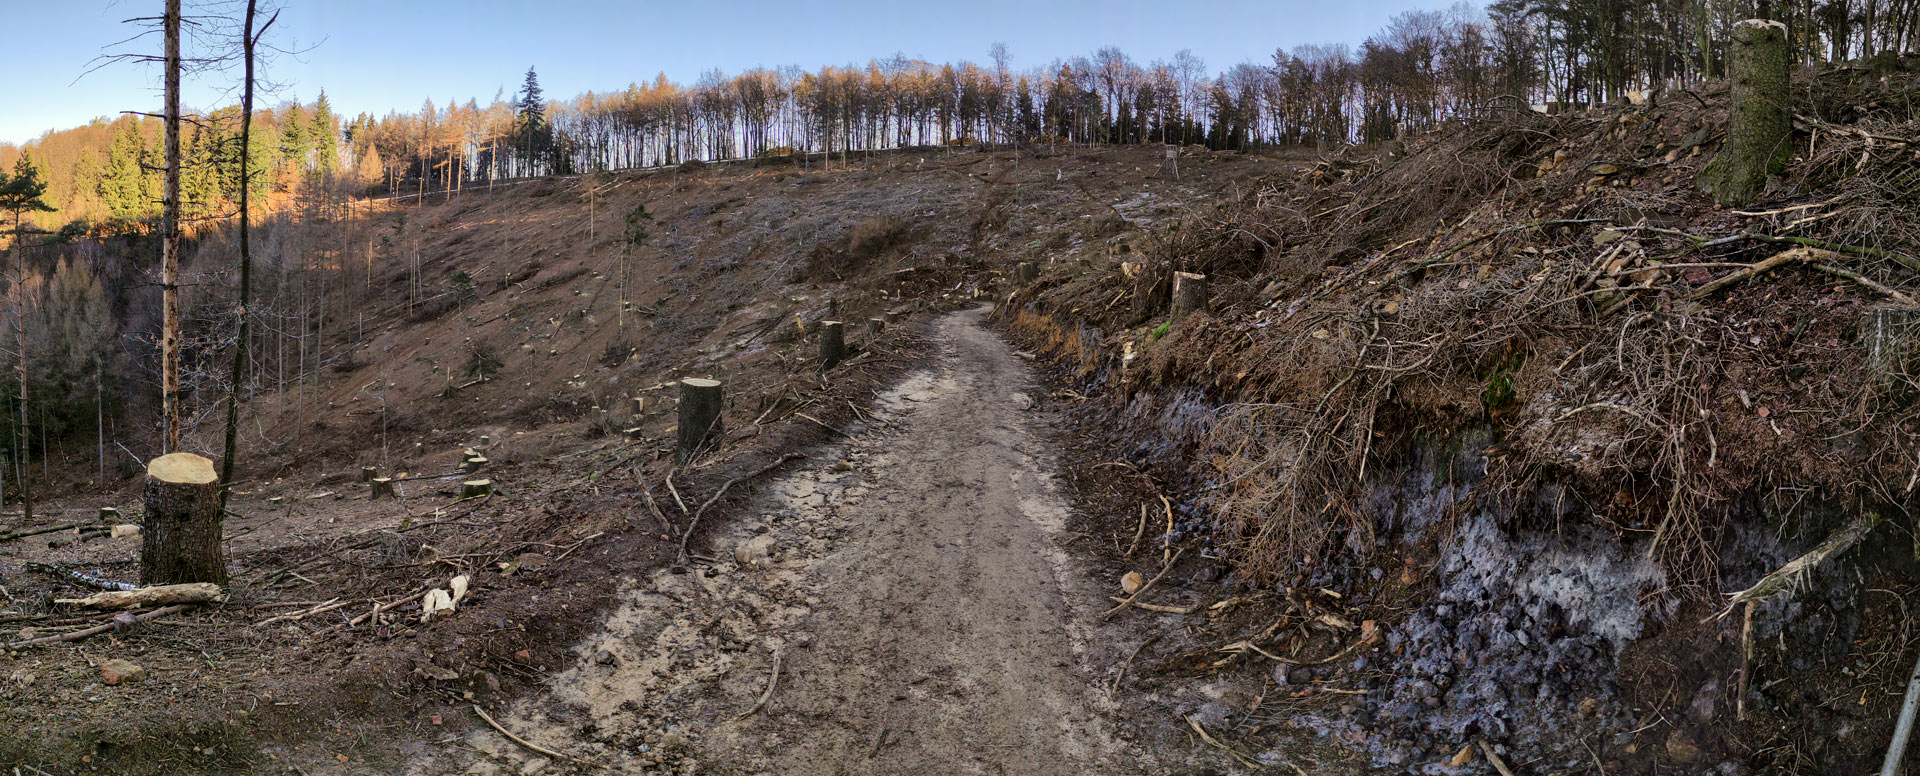 Panorama Teutoburger Wald abgeholzt